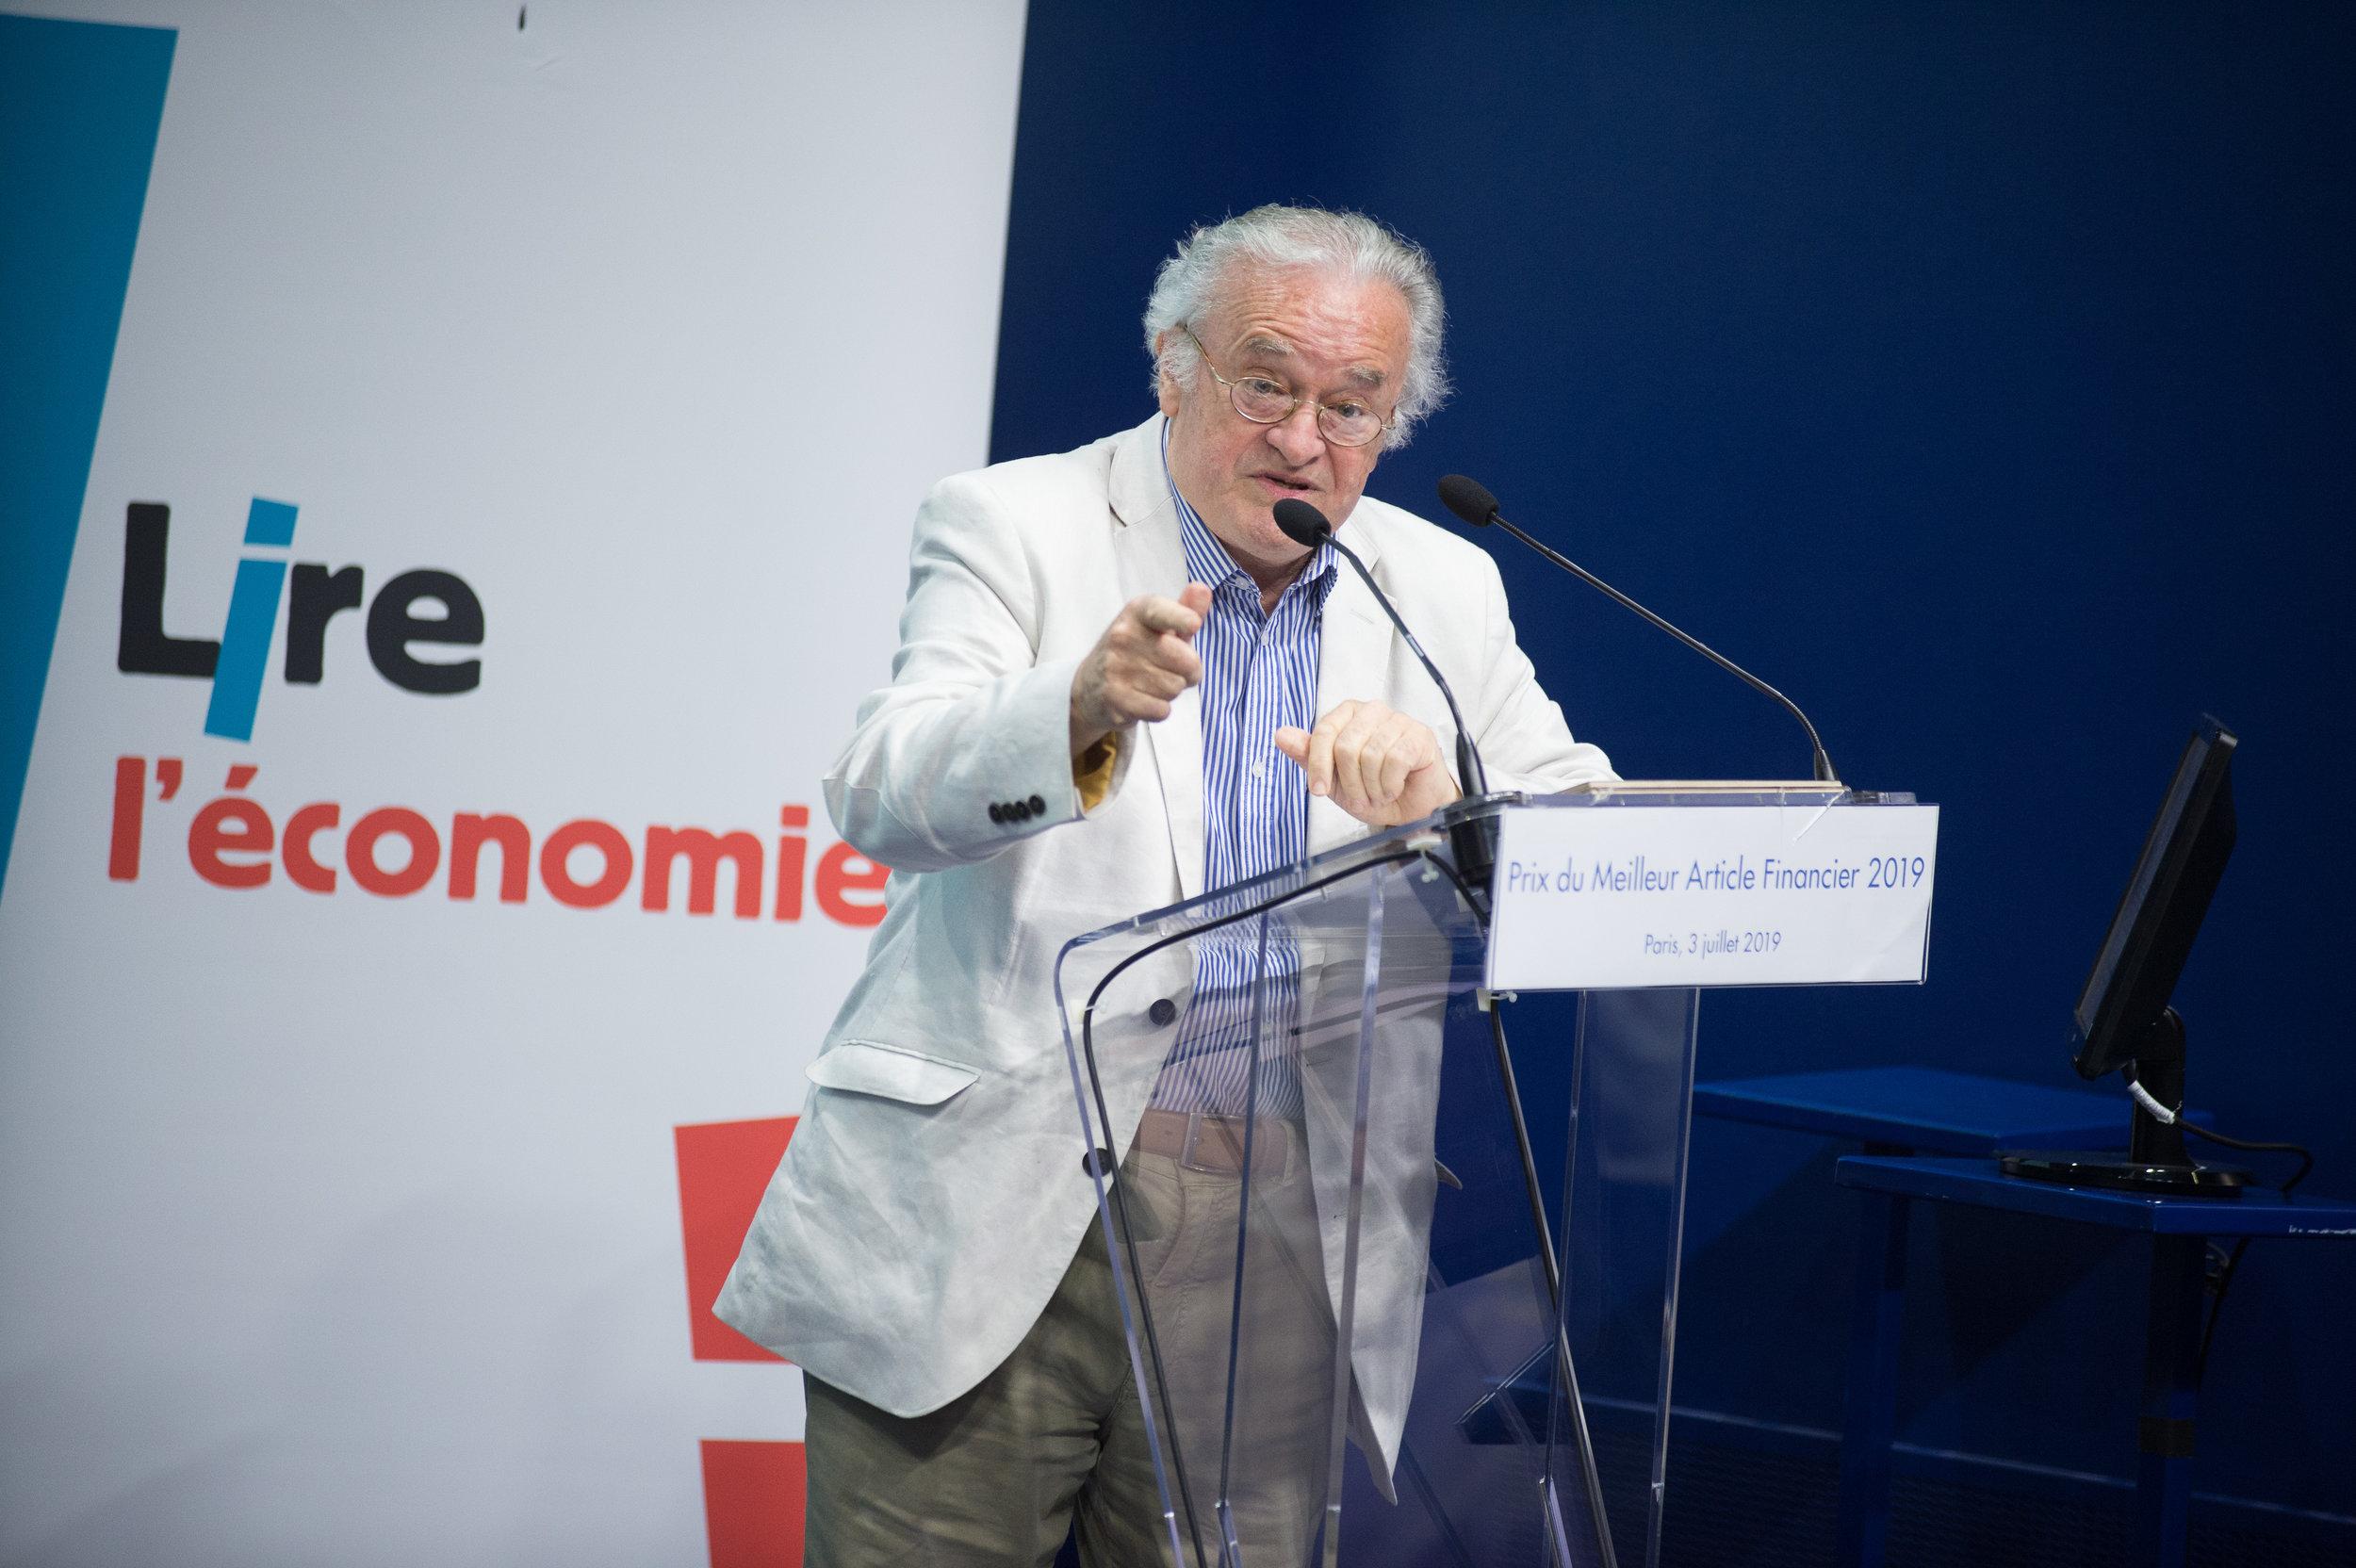 © Banque de France – Philippe Jolivel